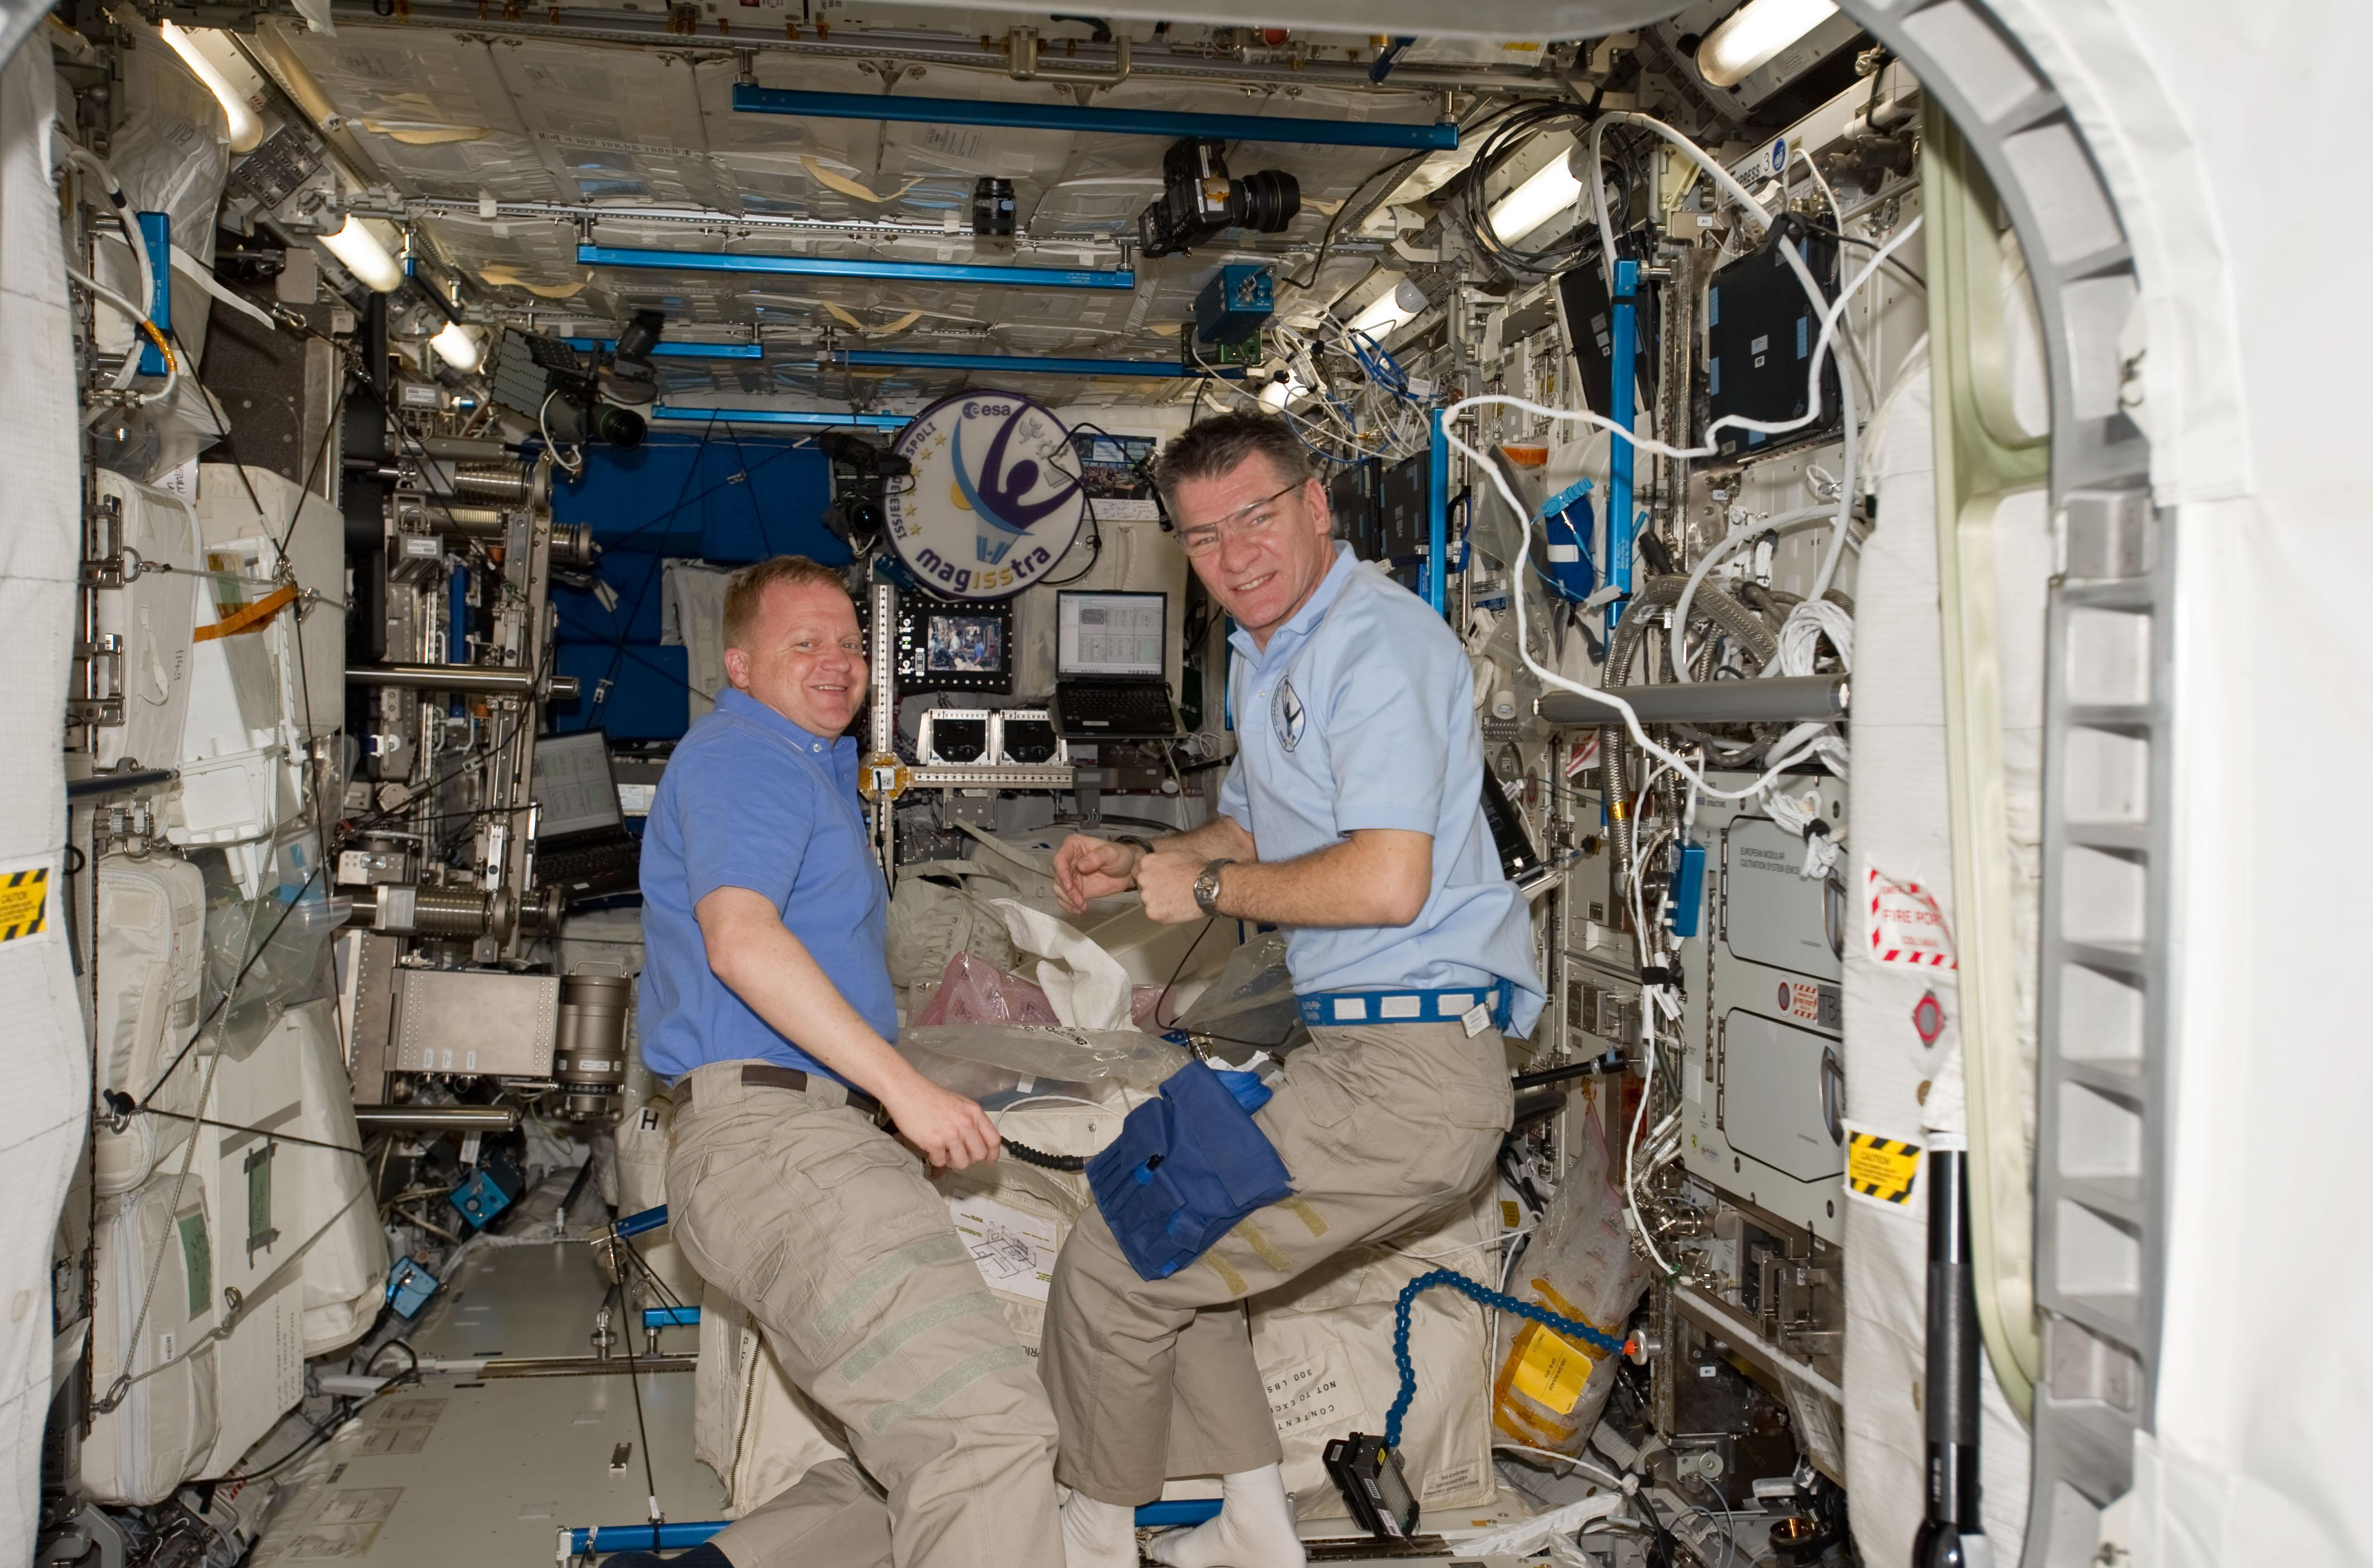 yosemite international space station - photo #26